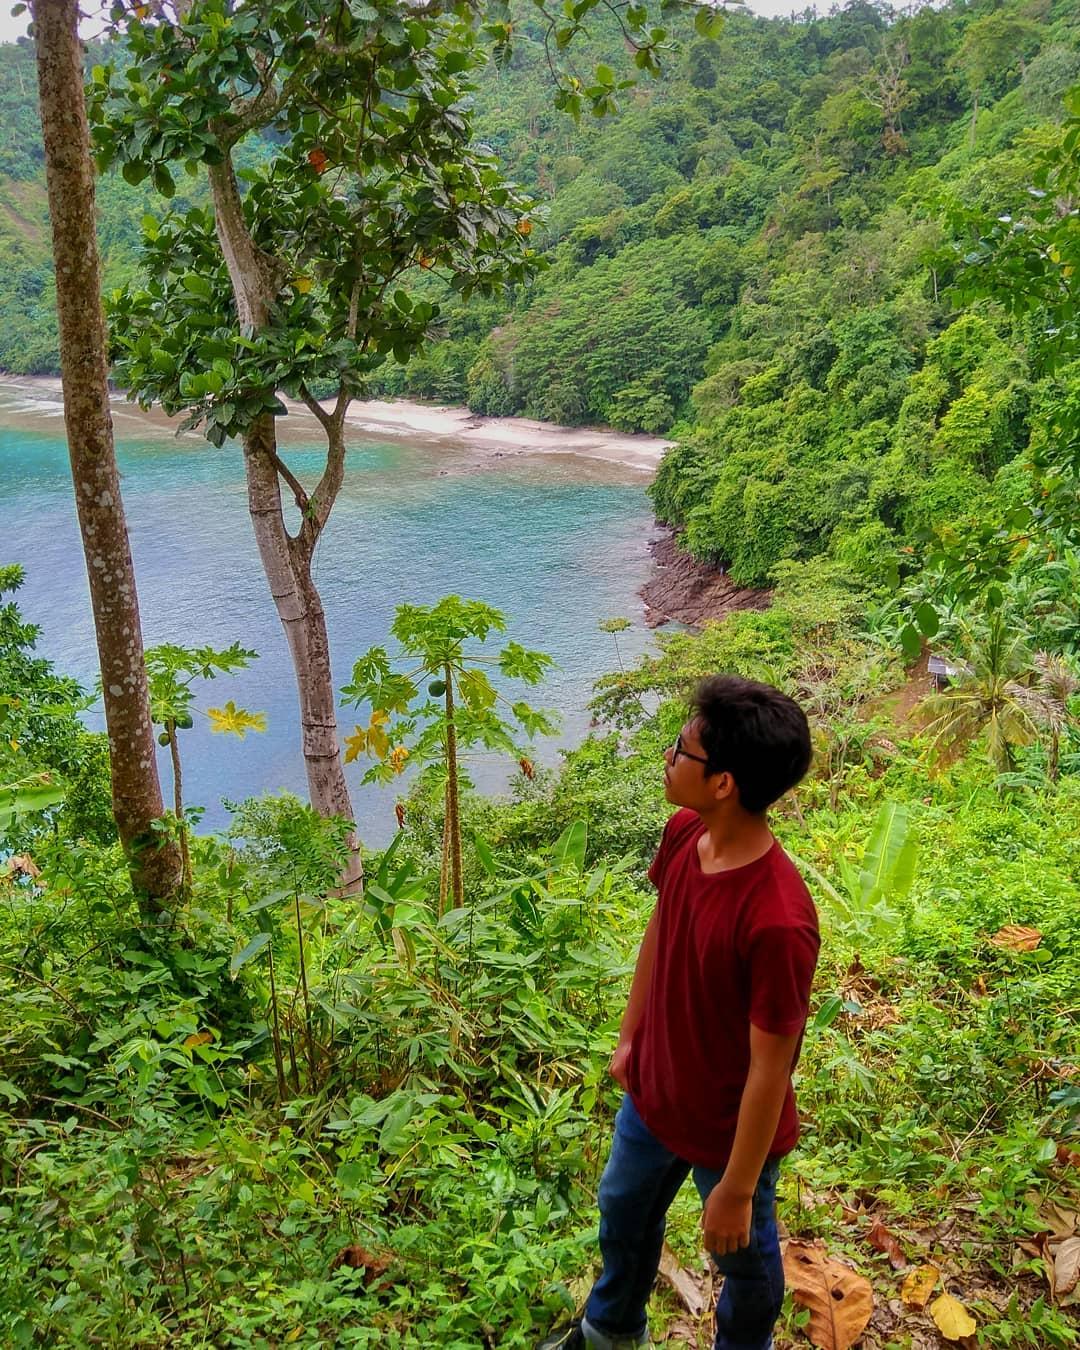 Yes Call It A Hidden Paradise in Malang, Malang, Kabupaten Malang, Dolan Dolen, Dolaners Yes Call It A Hidden Paradise in Malang via ald 63 - Dolan Dolen